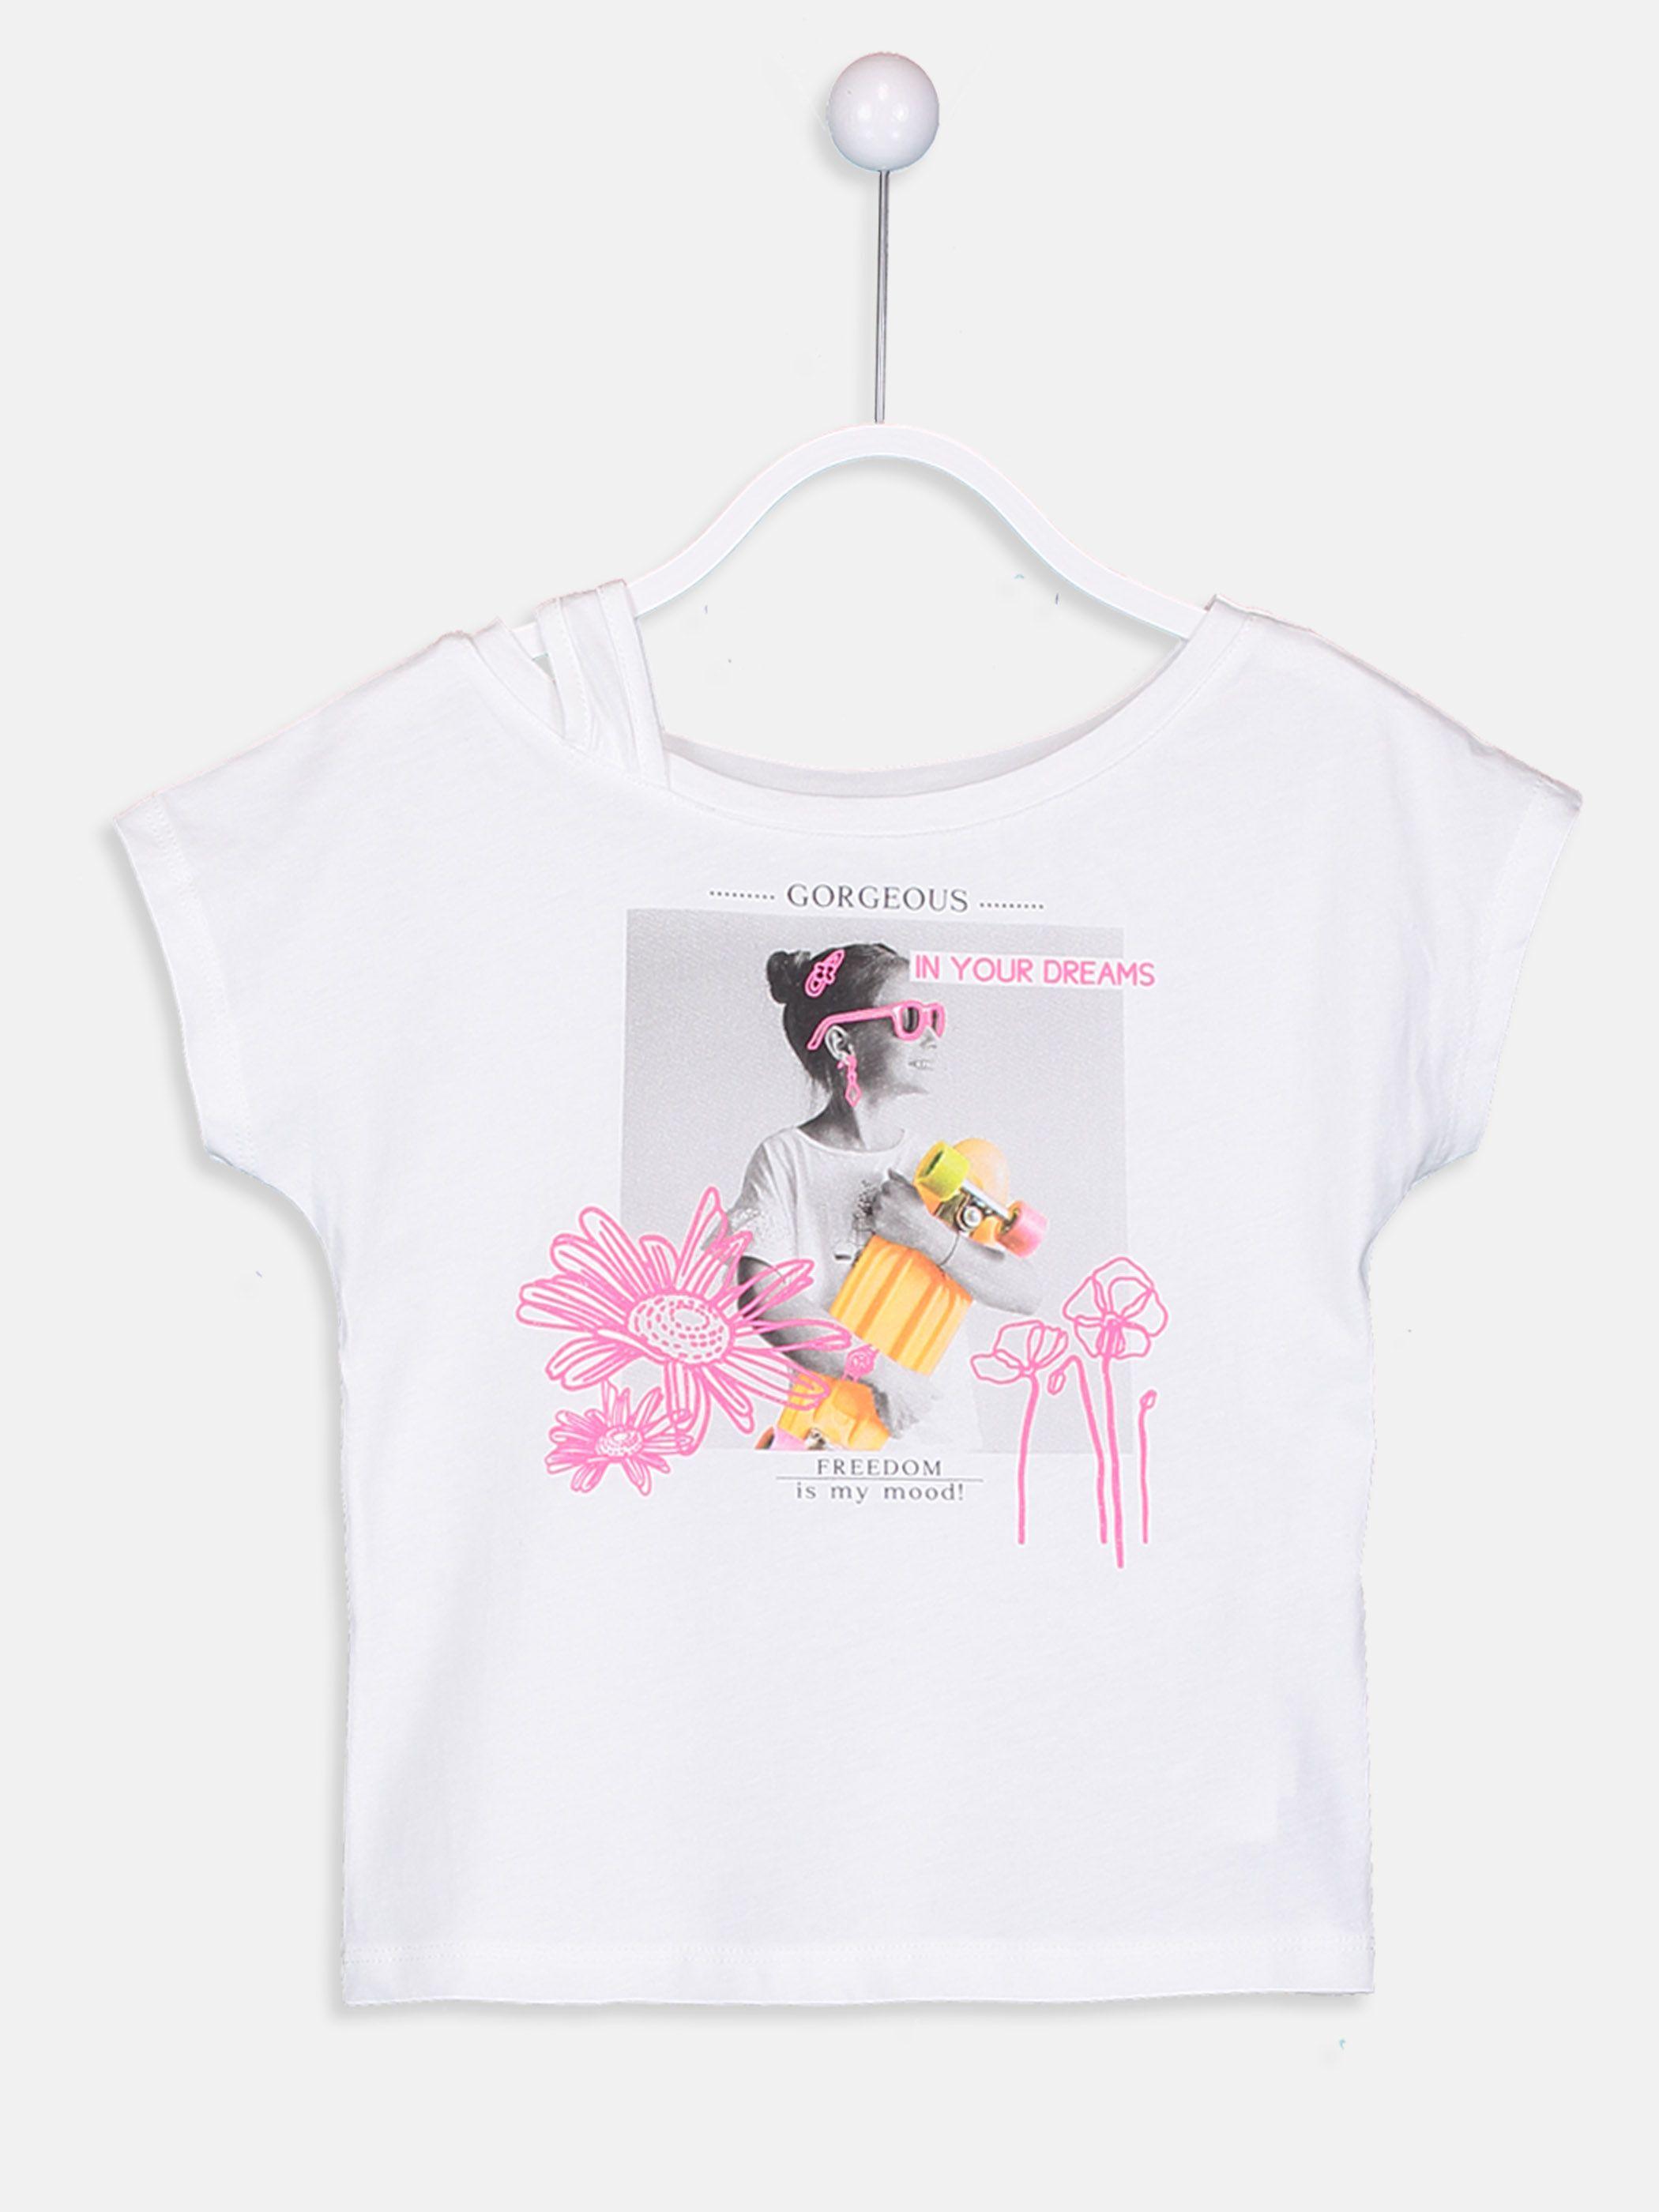 Elbise Lc Waikiki 59 95 Tl Elbise Cicekli Kiz Elbiseleri Pembe Elbiseler